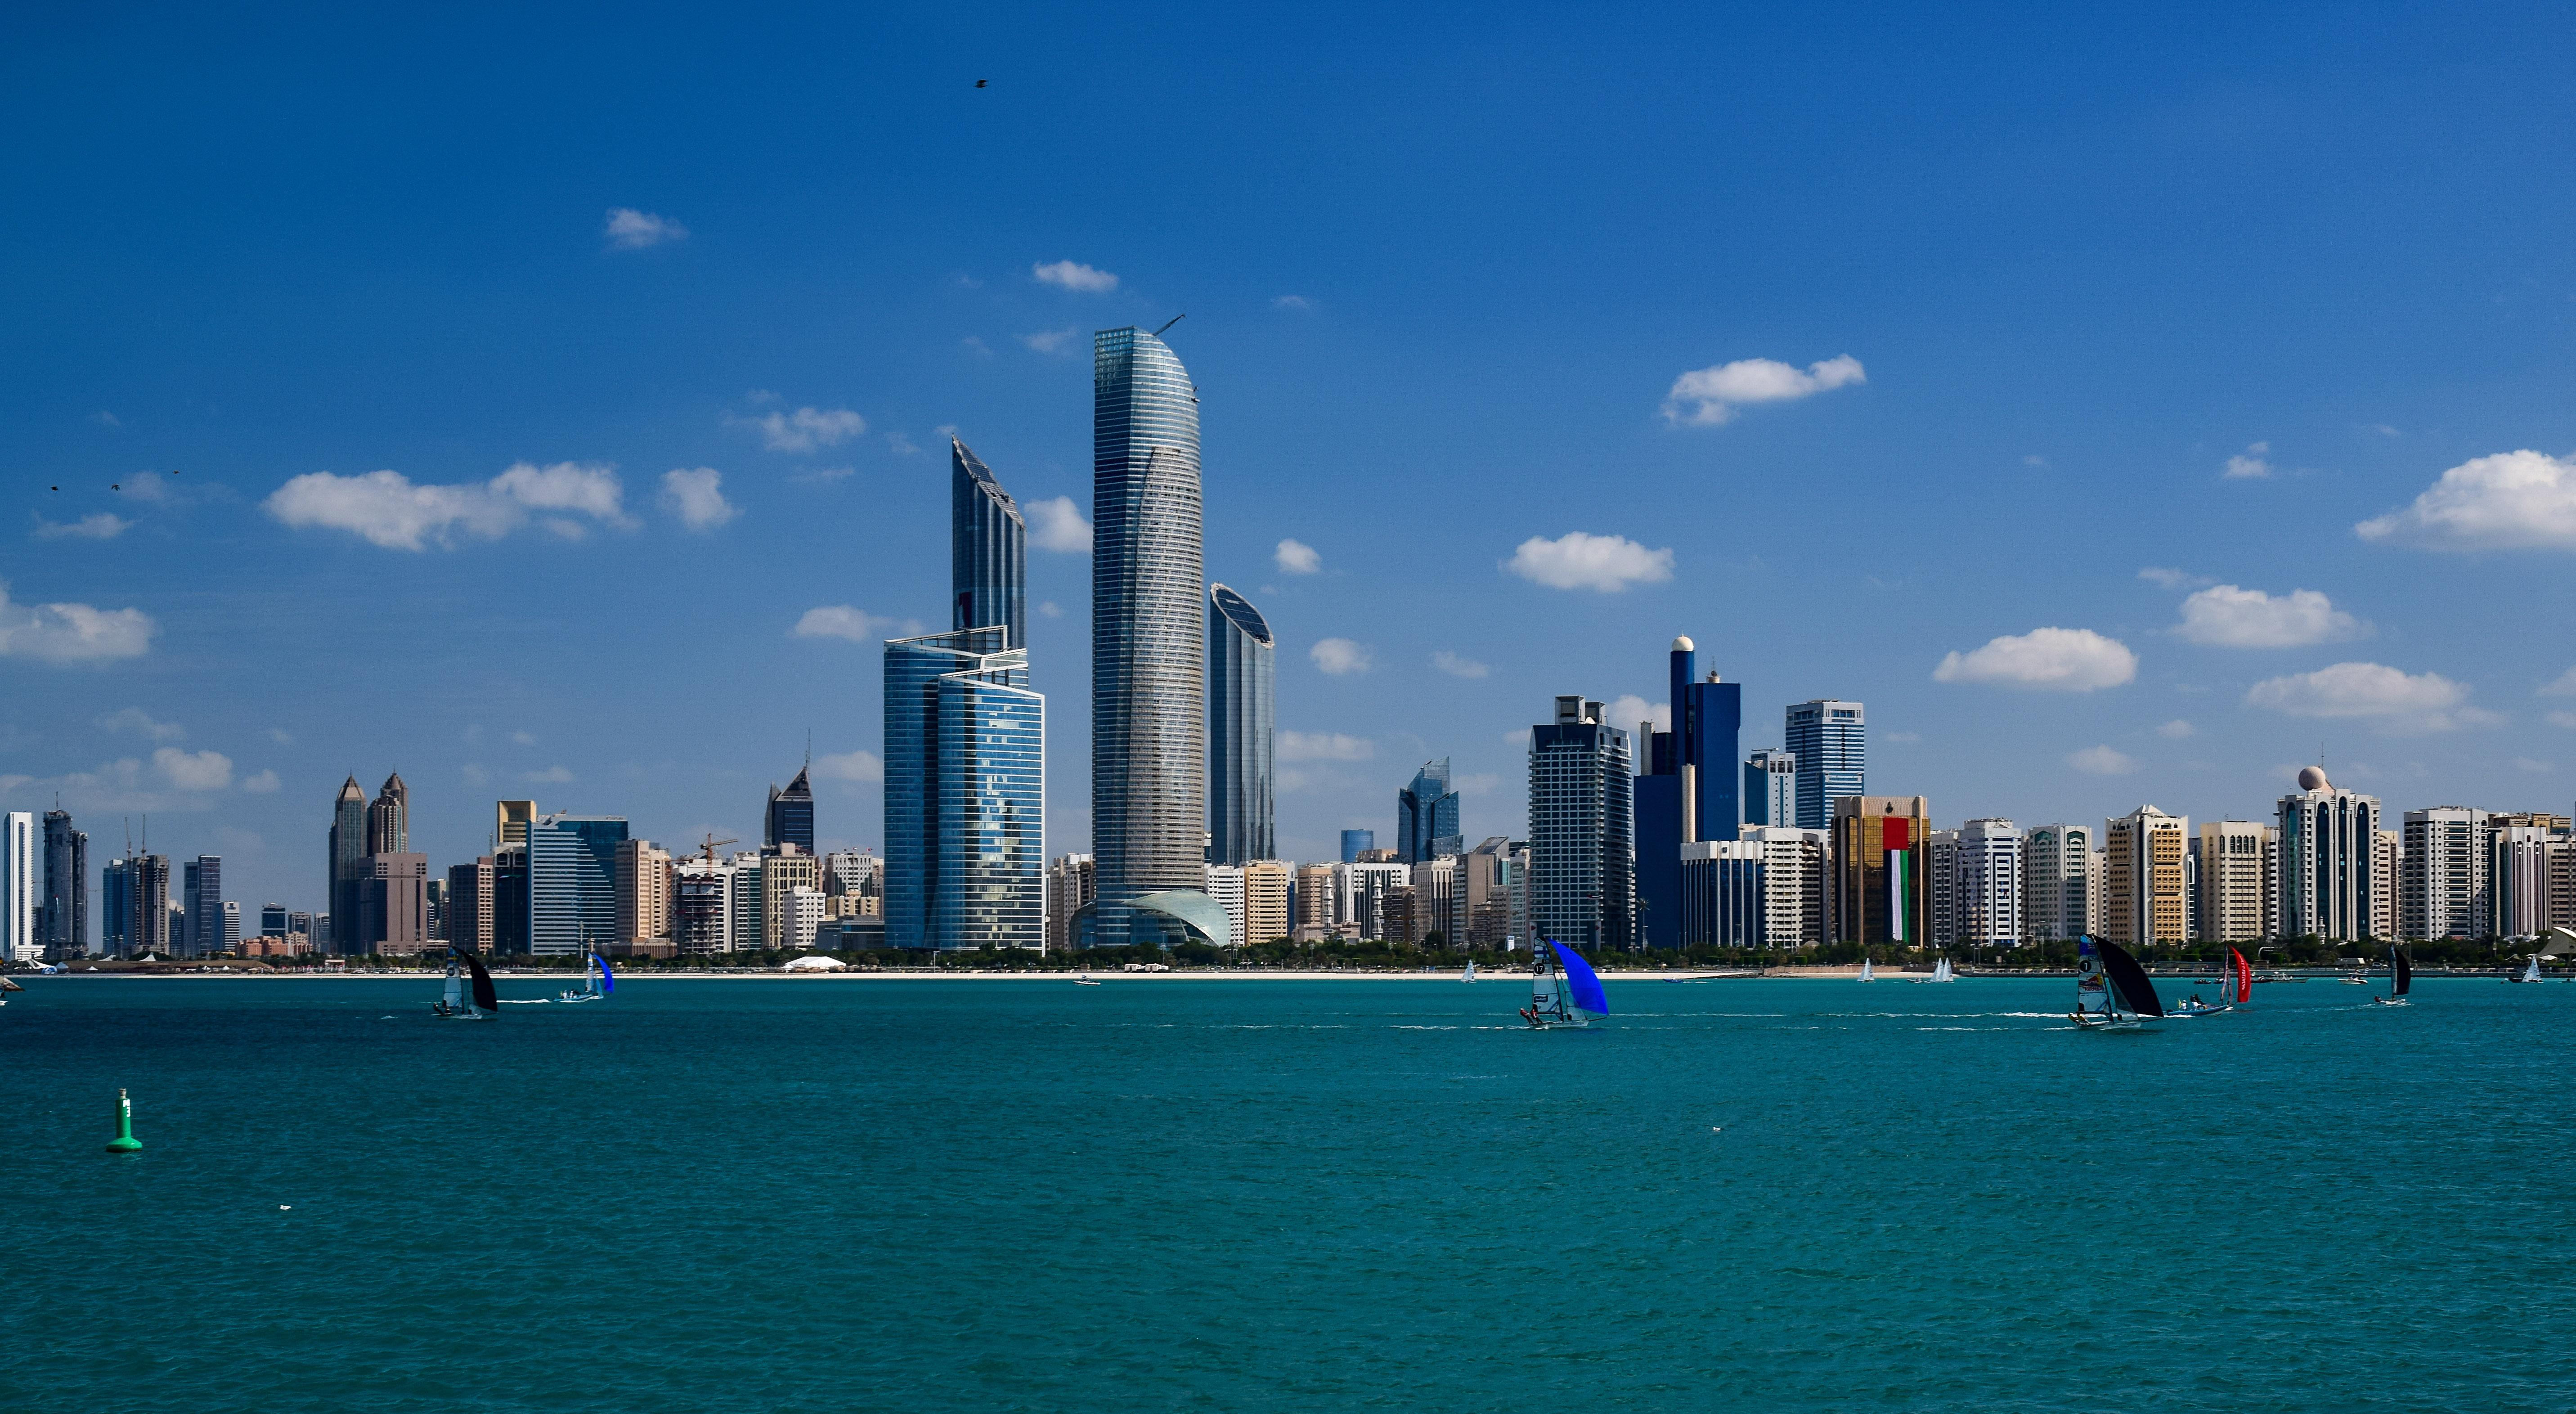 File:Abu dhabi skylines 2014.jpg - Wikimedia Commons